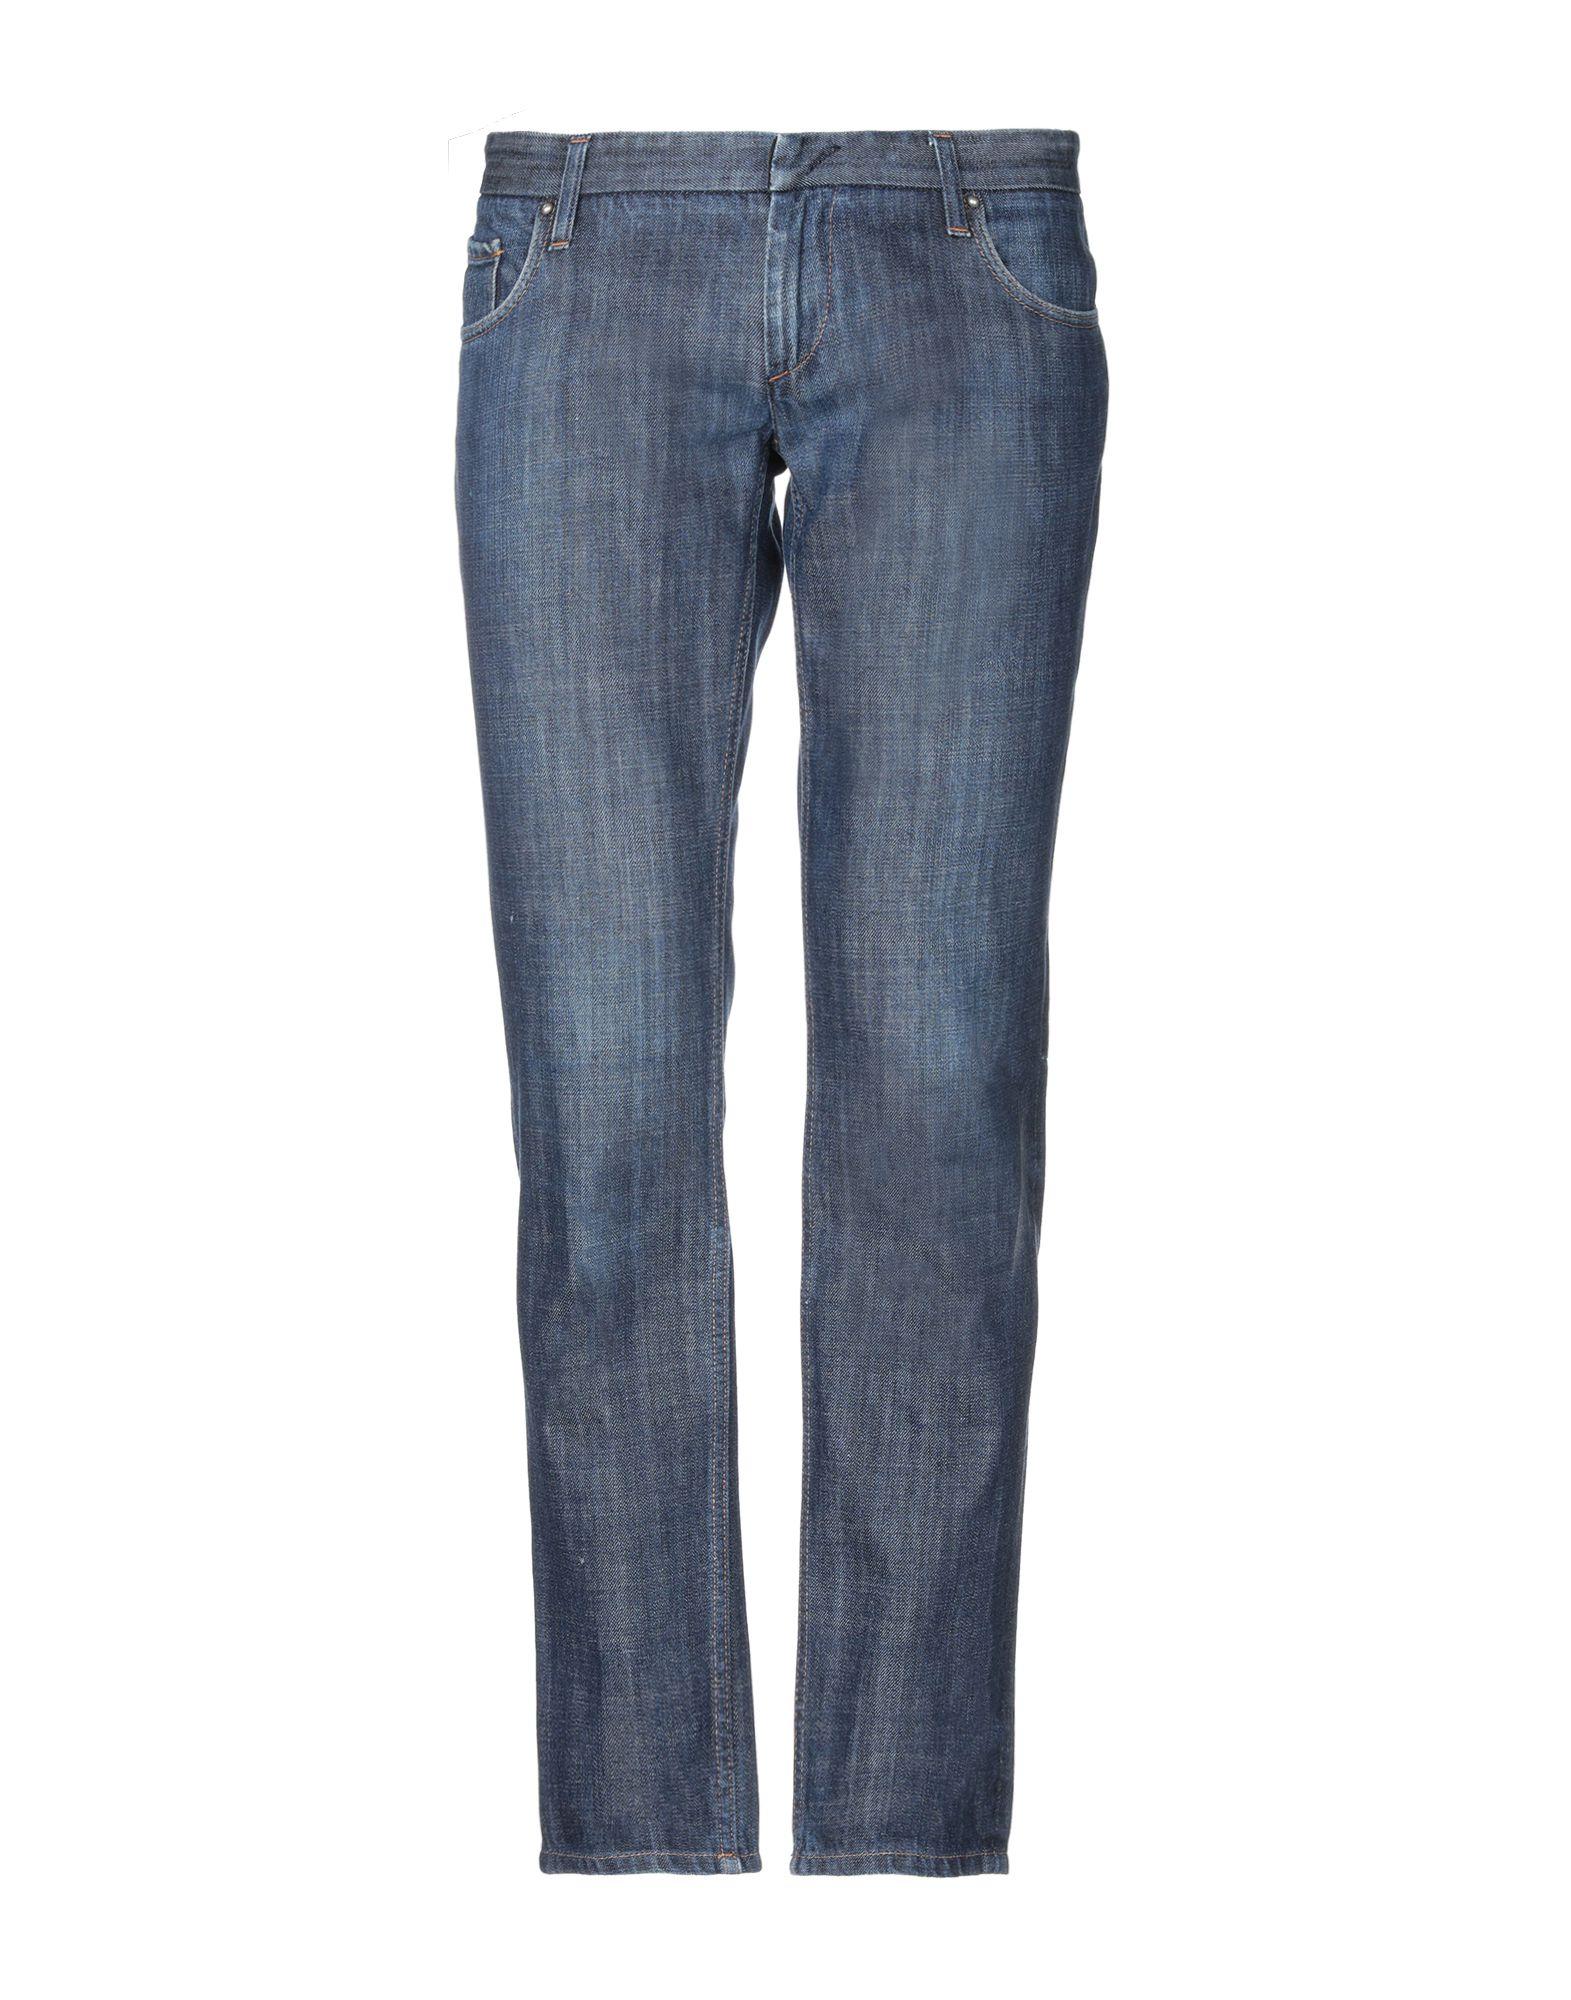 COSTUME NATIONAL HOMME Джинсовые брюки costume national homme футболка